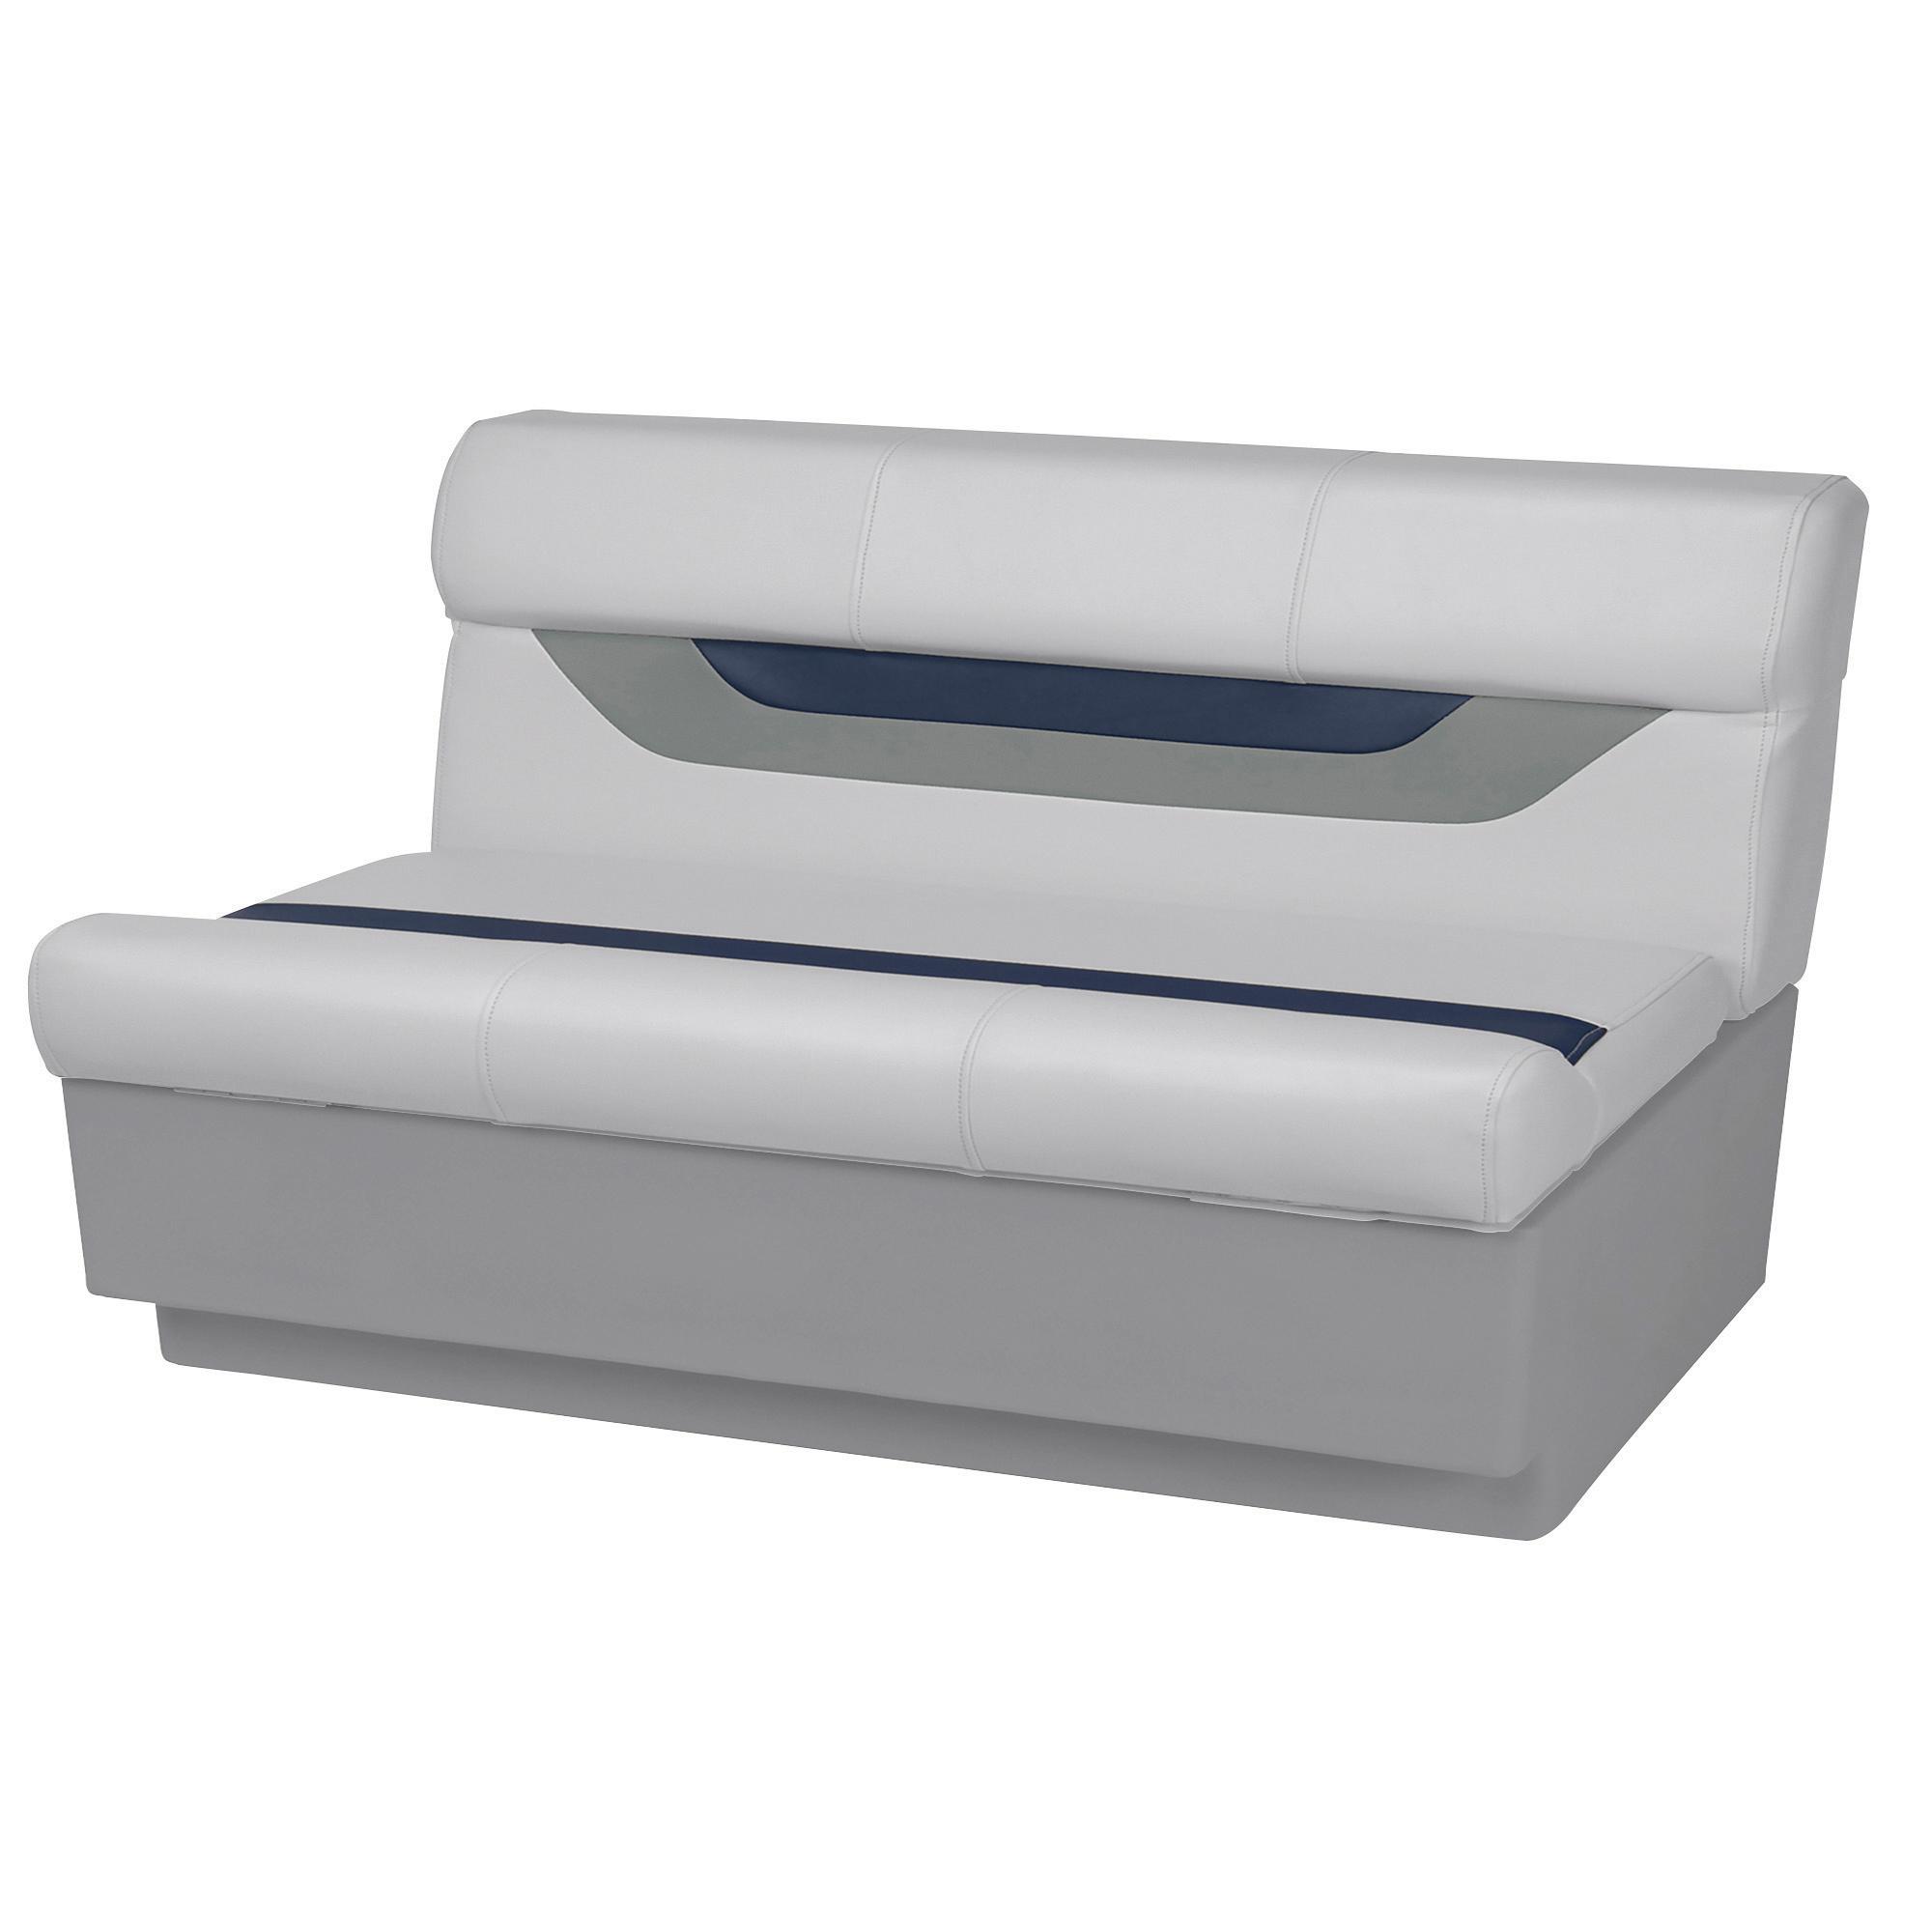 "Toonmate Designer Pontoon 55"" Wide Bench Seat, Sky Gray"